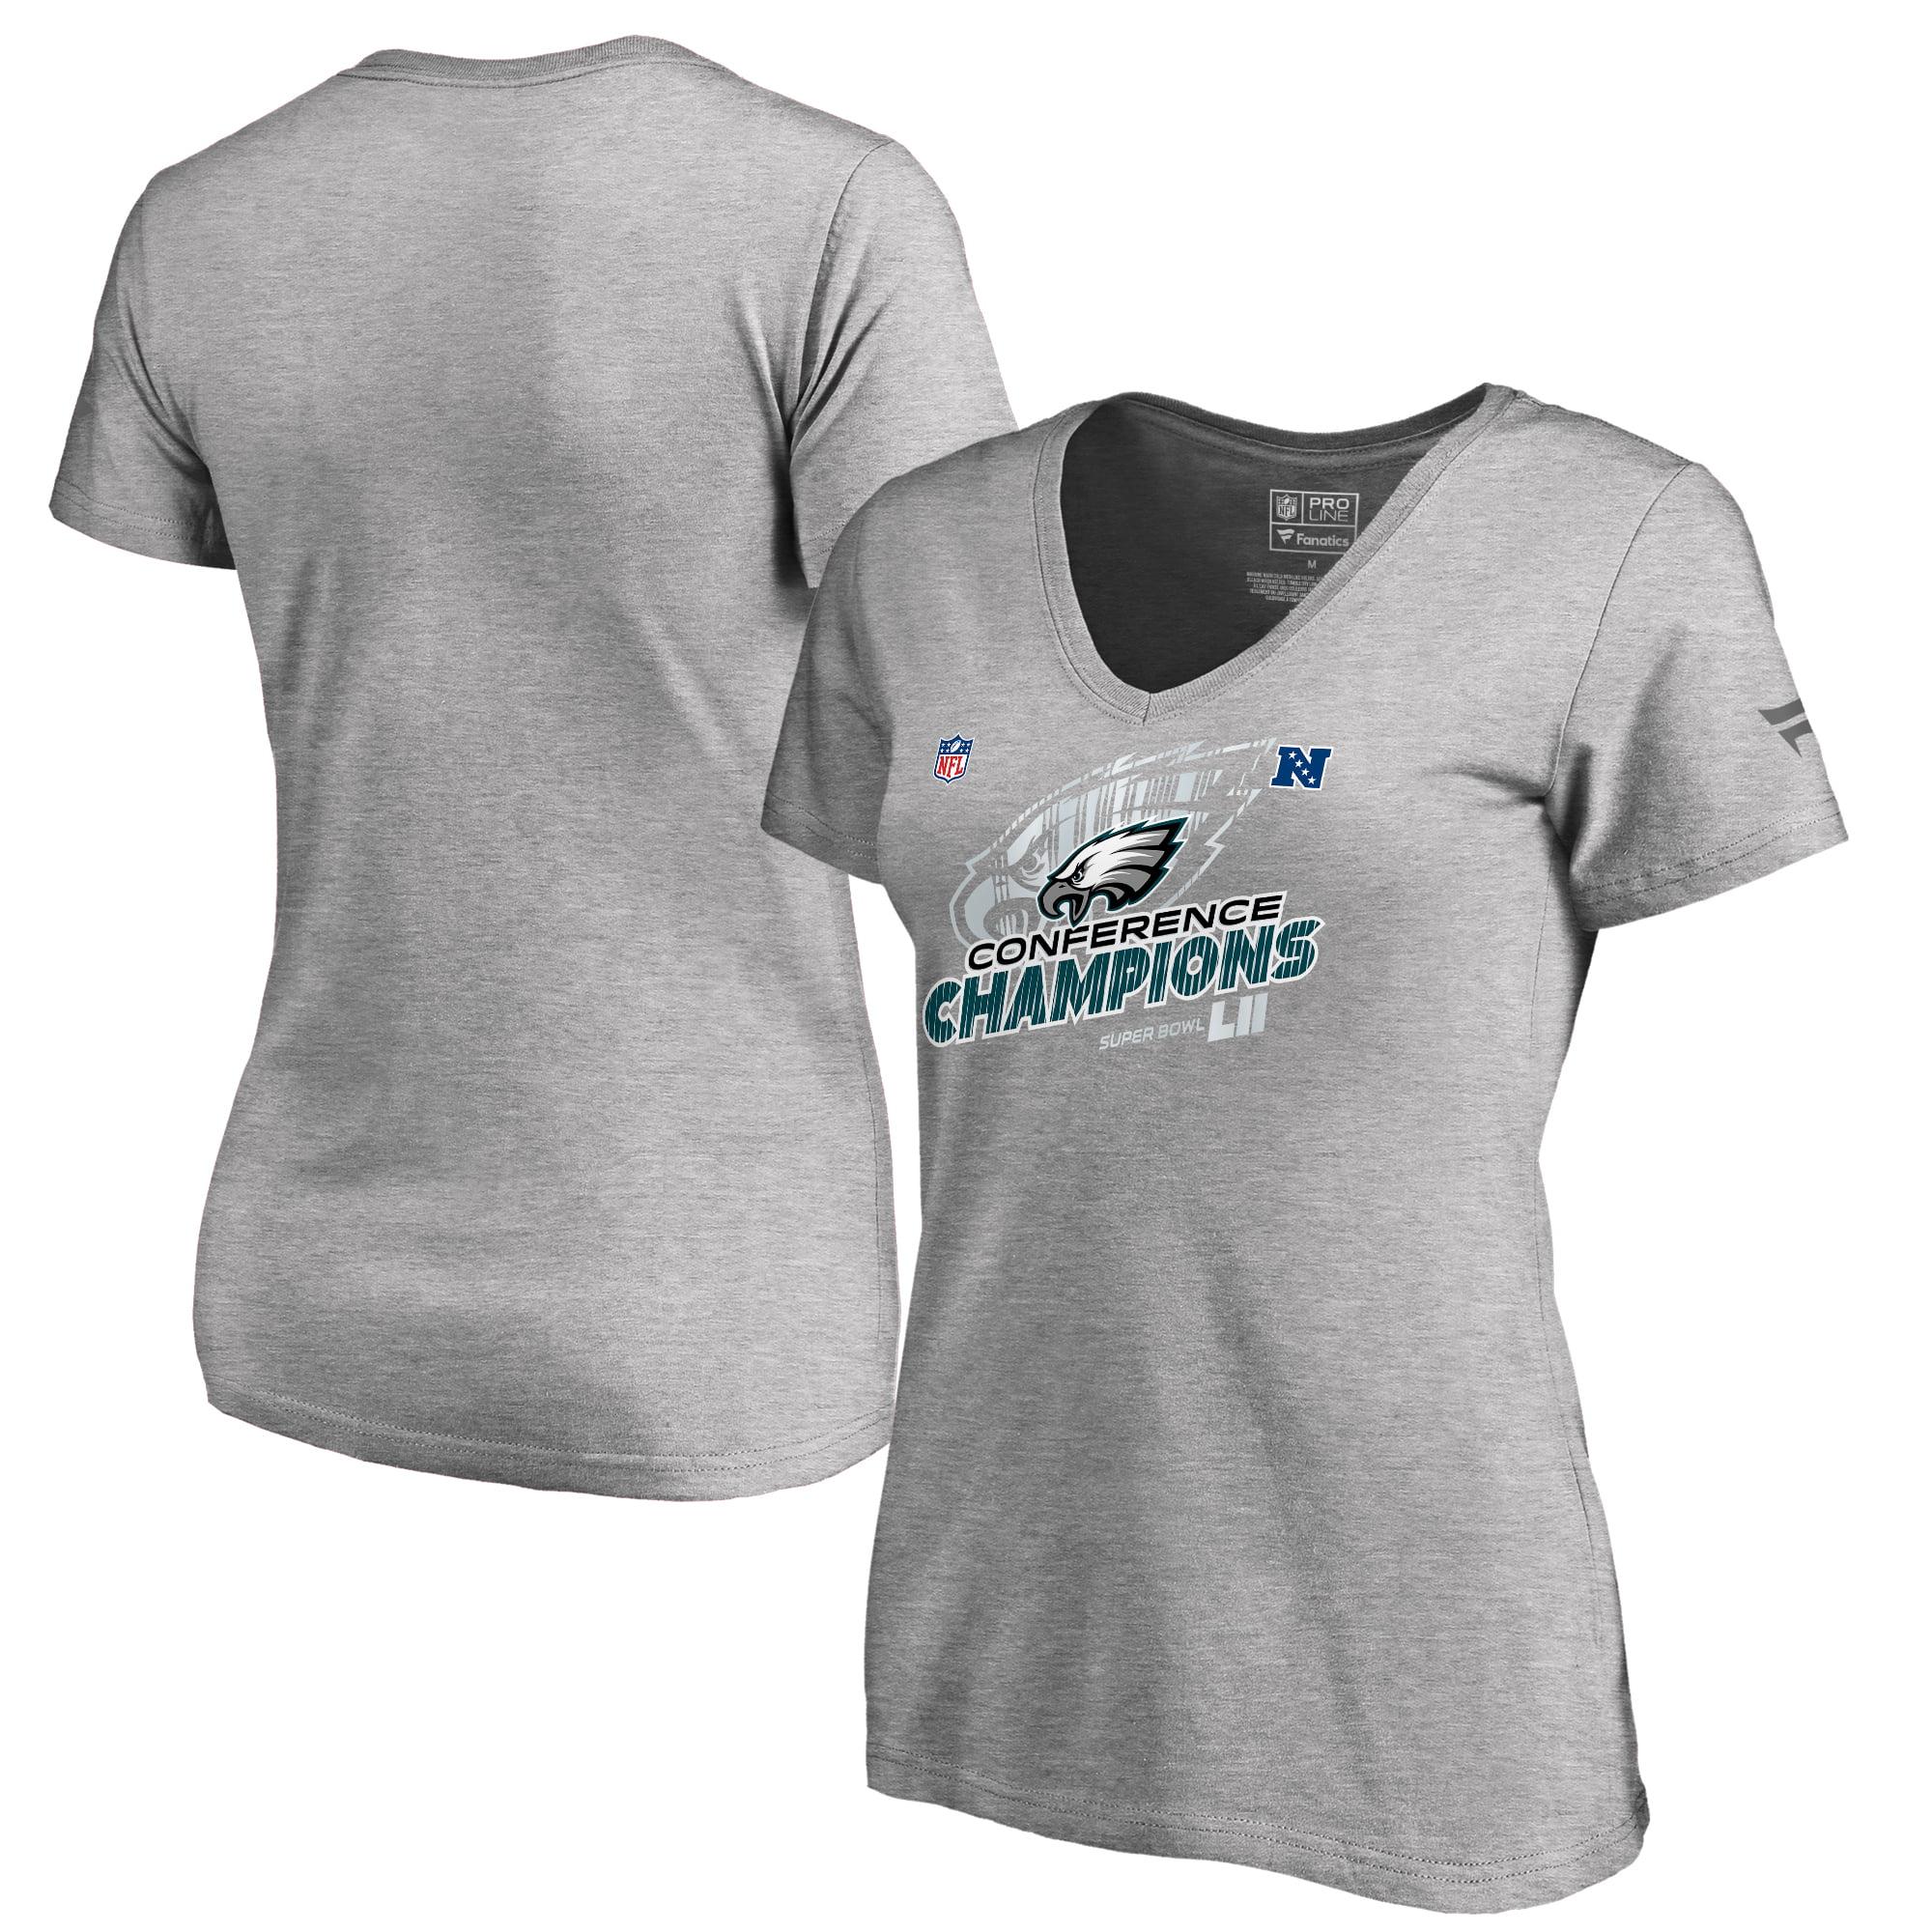 Philadelphia Eagles NFL Pro Line by Fanatics Branded Women's 2017 NFC Champions Trophy Collection Locker Room Plus Size V-Neck T-Shirt - Heather Gray